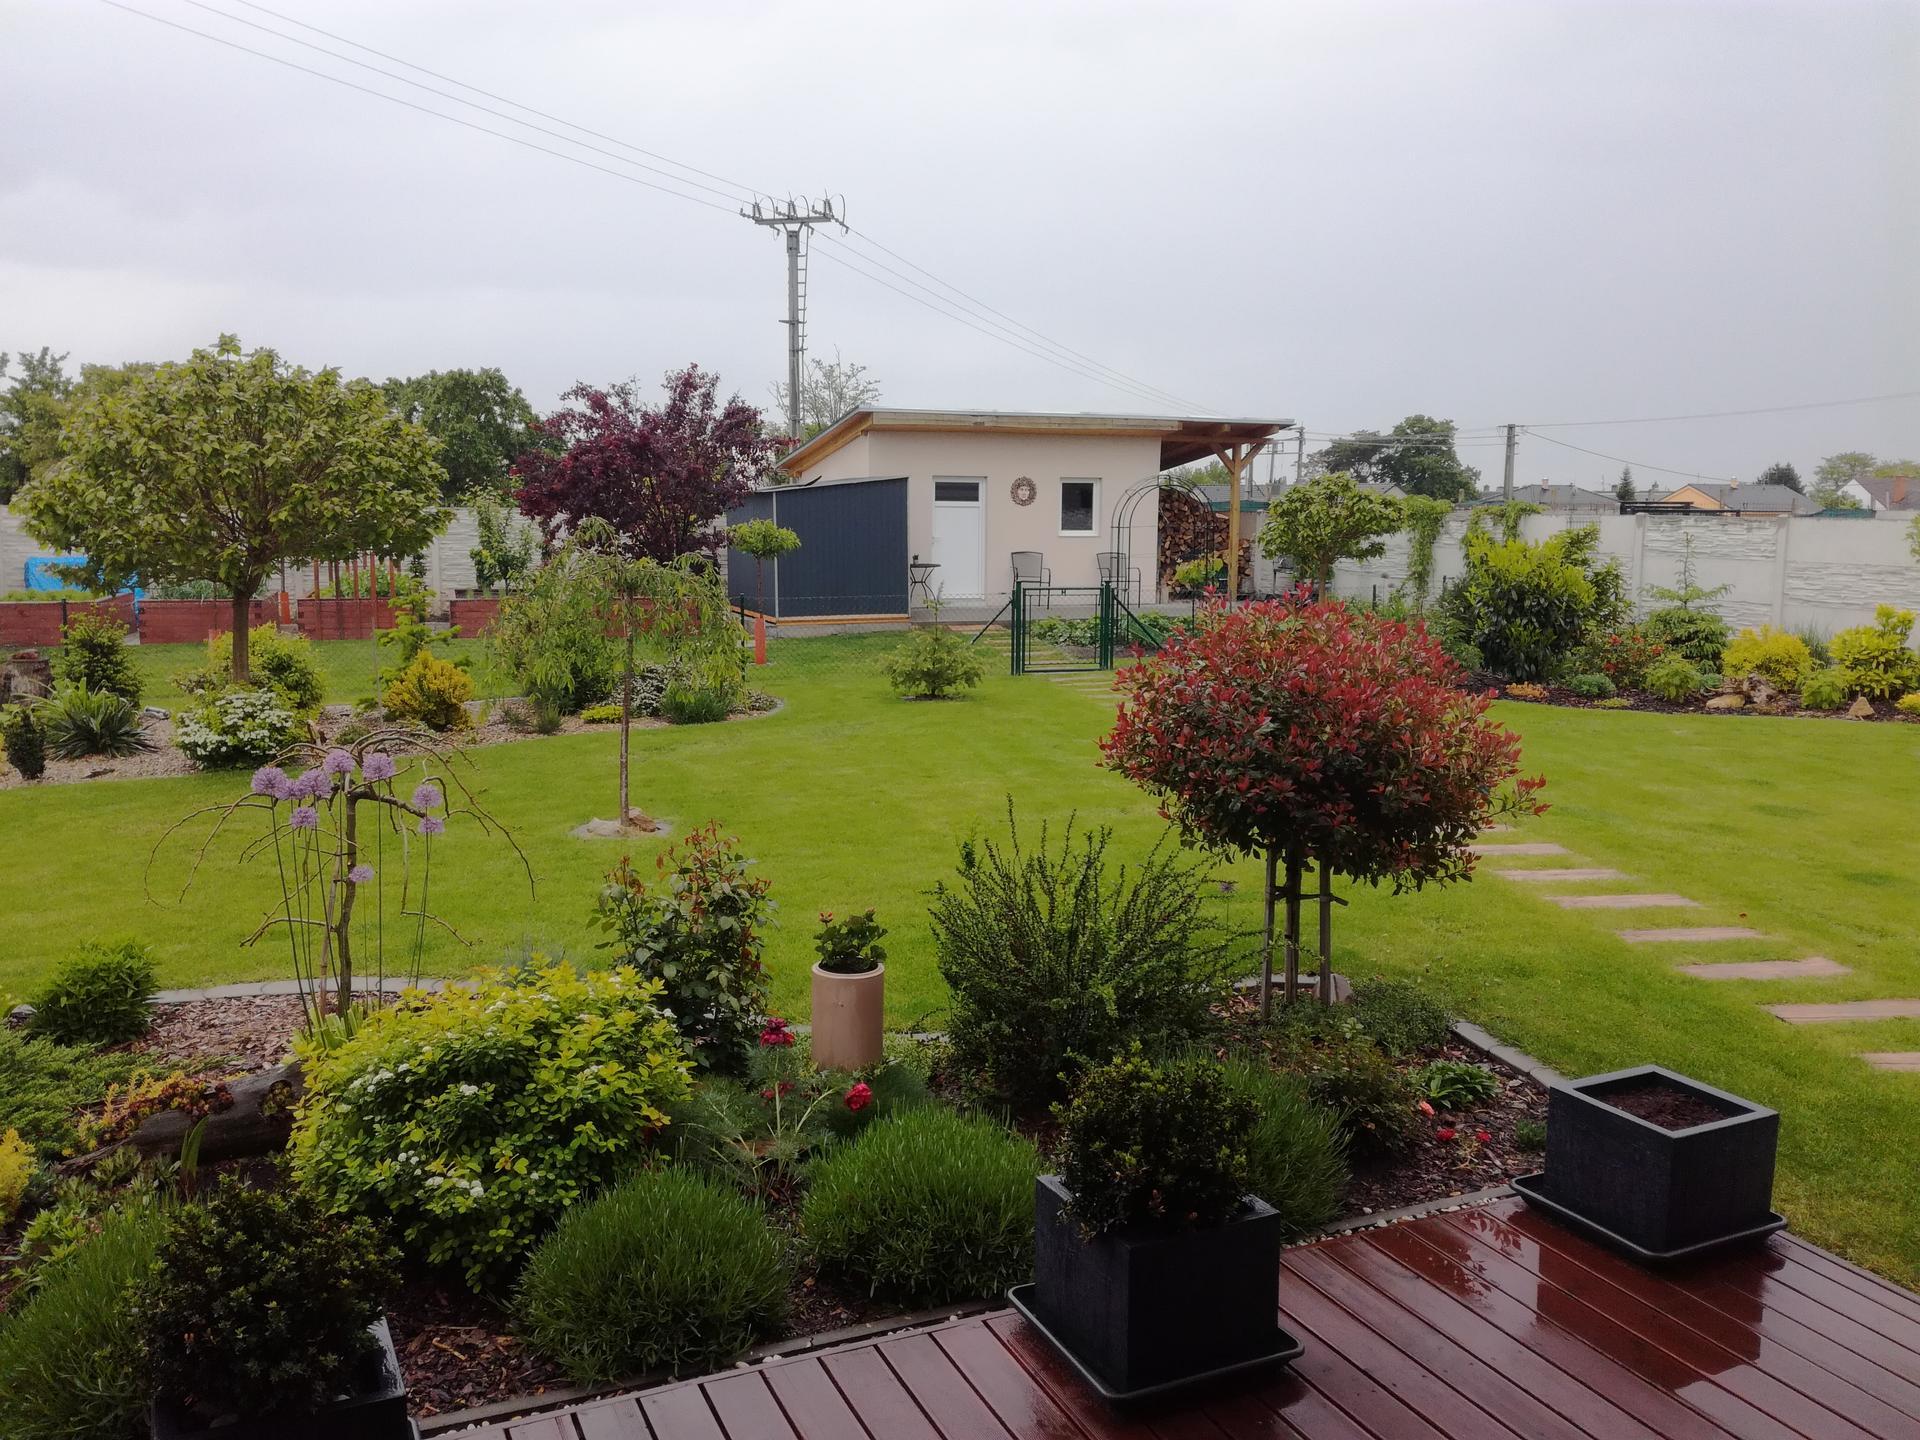 Zahrada 2021 🌲 - Obrázek č. 98